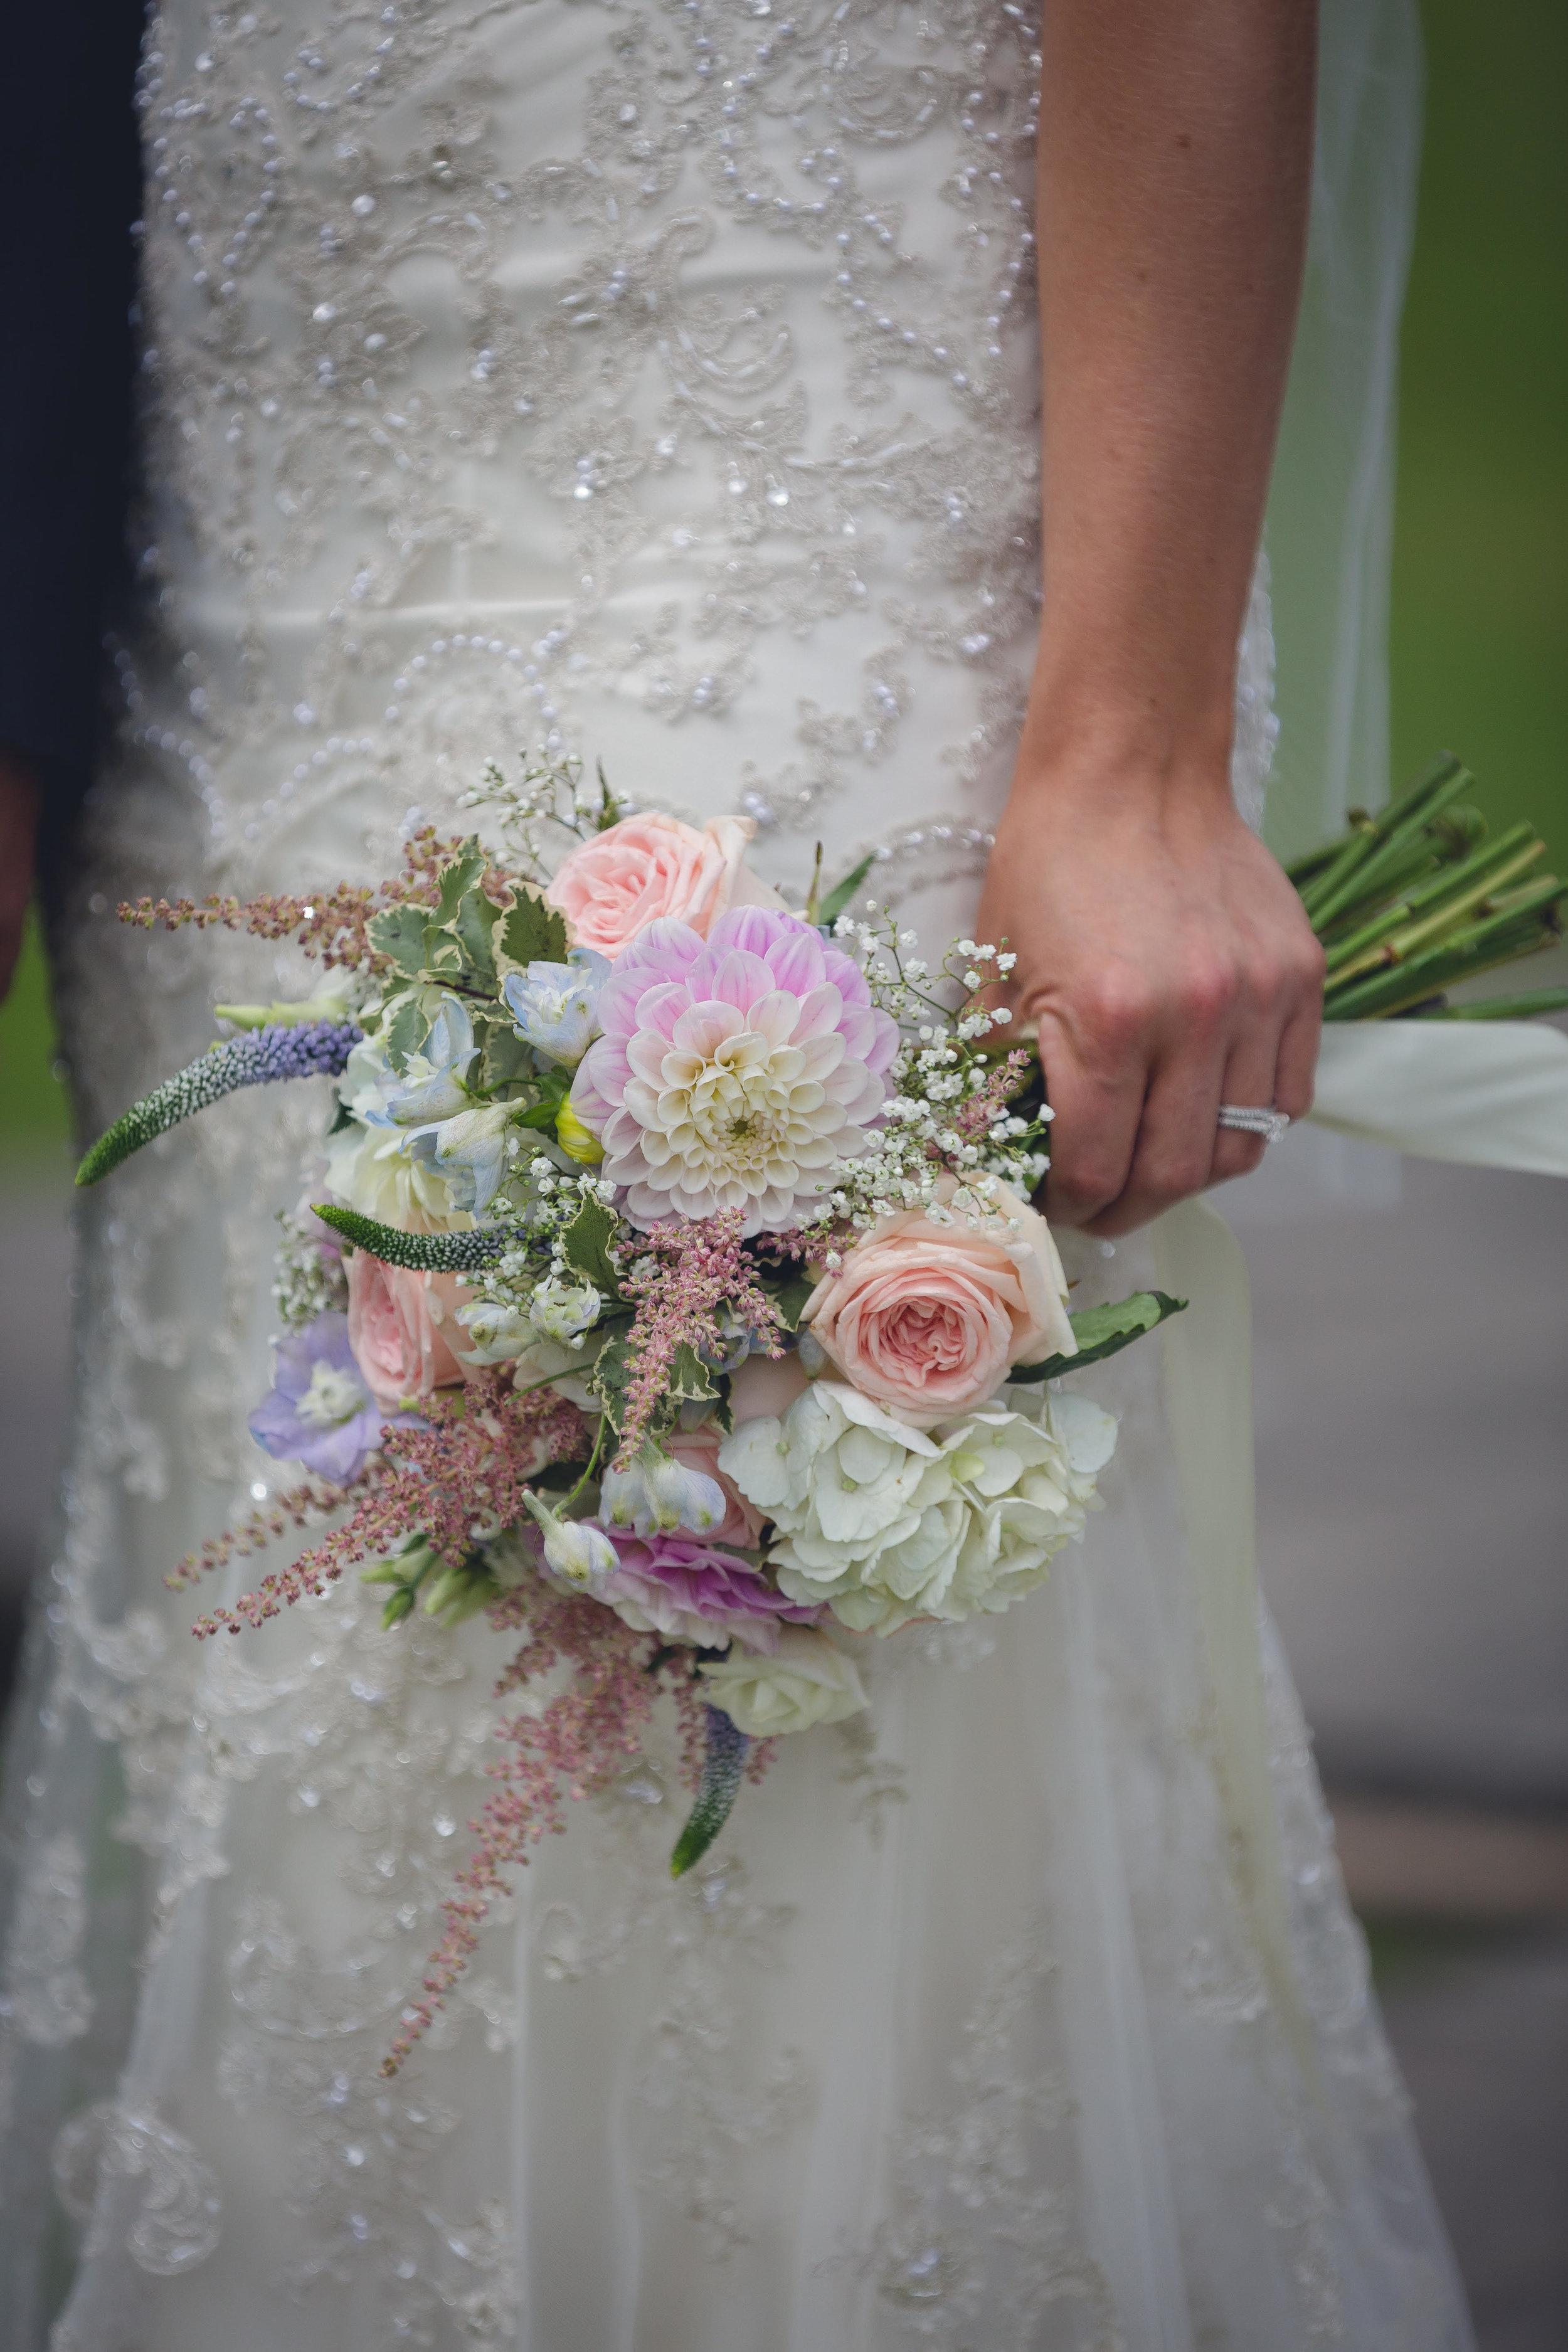 Katie and Adam - Garden Wedding 25 August 2017